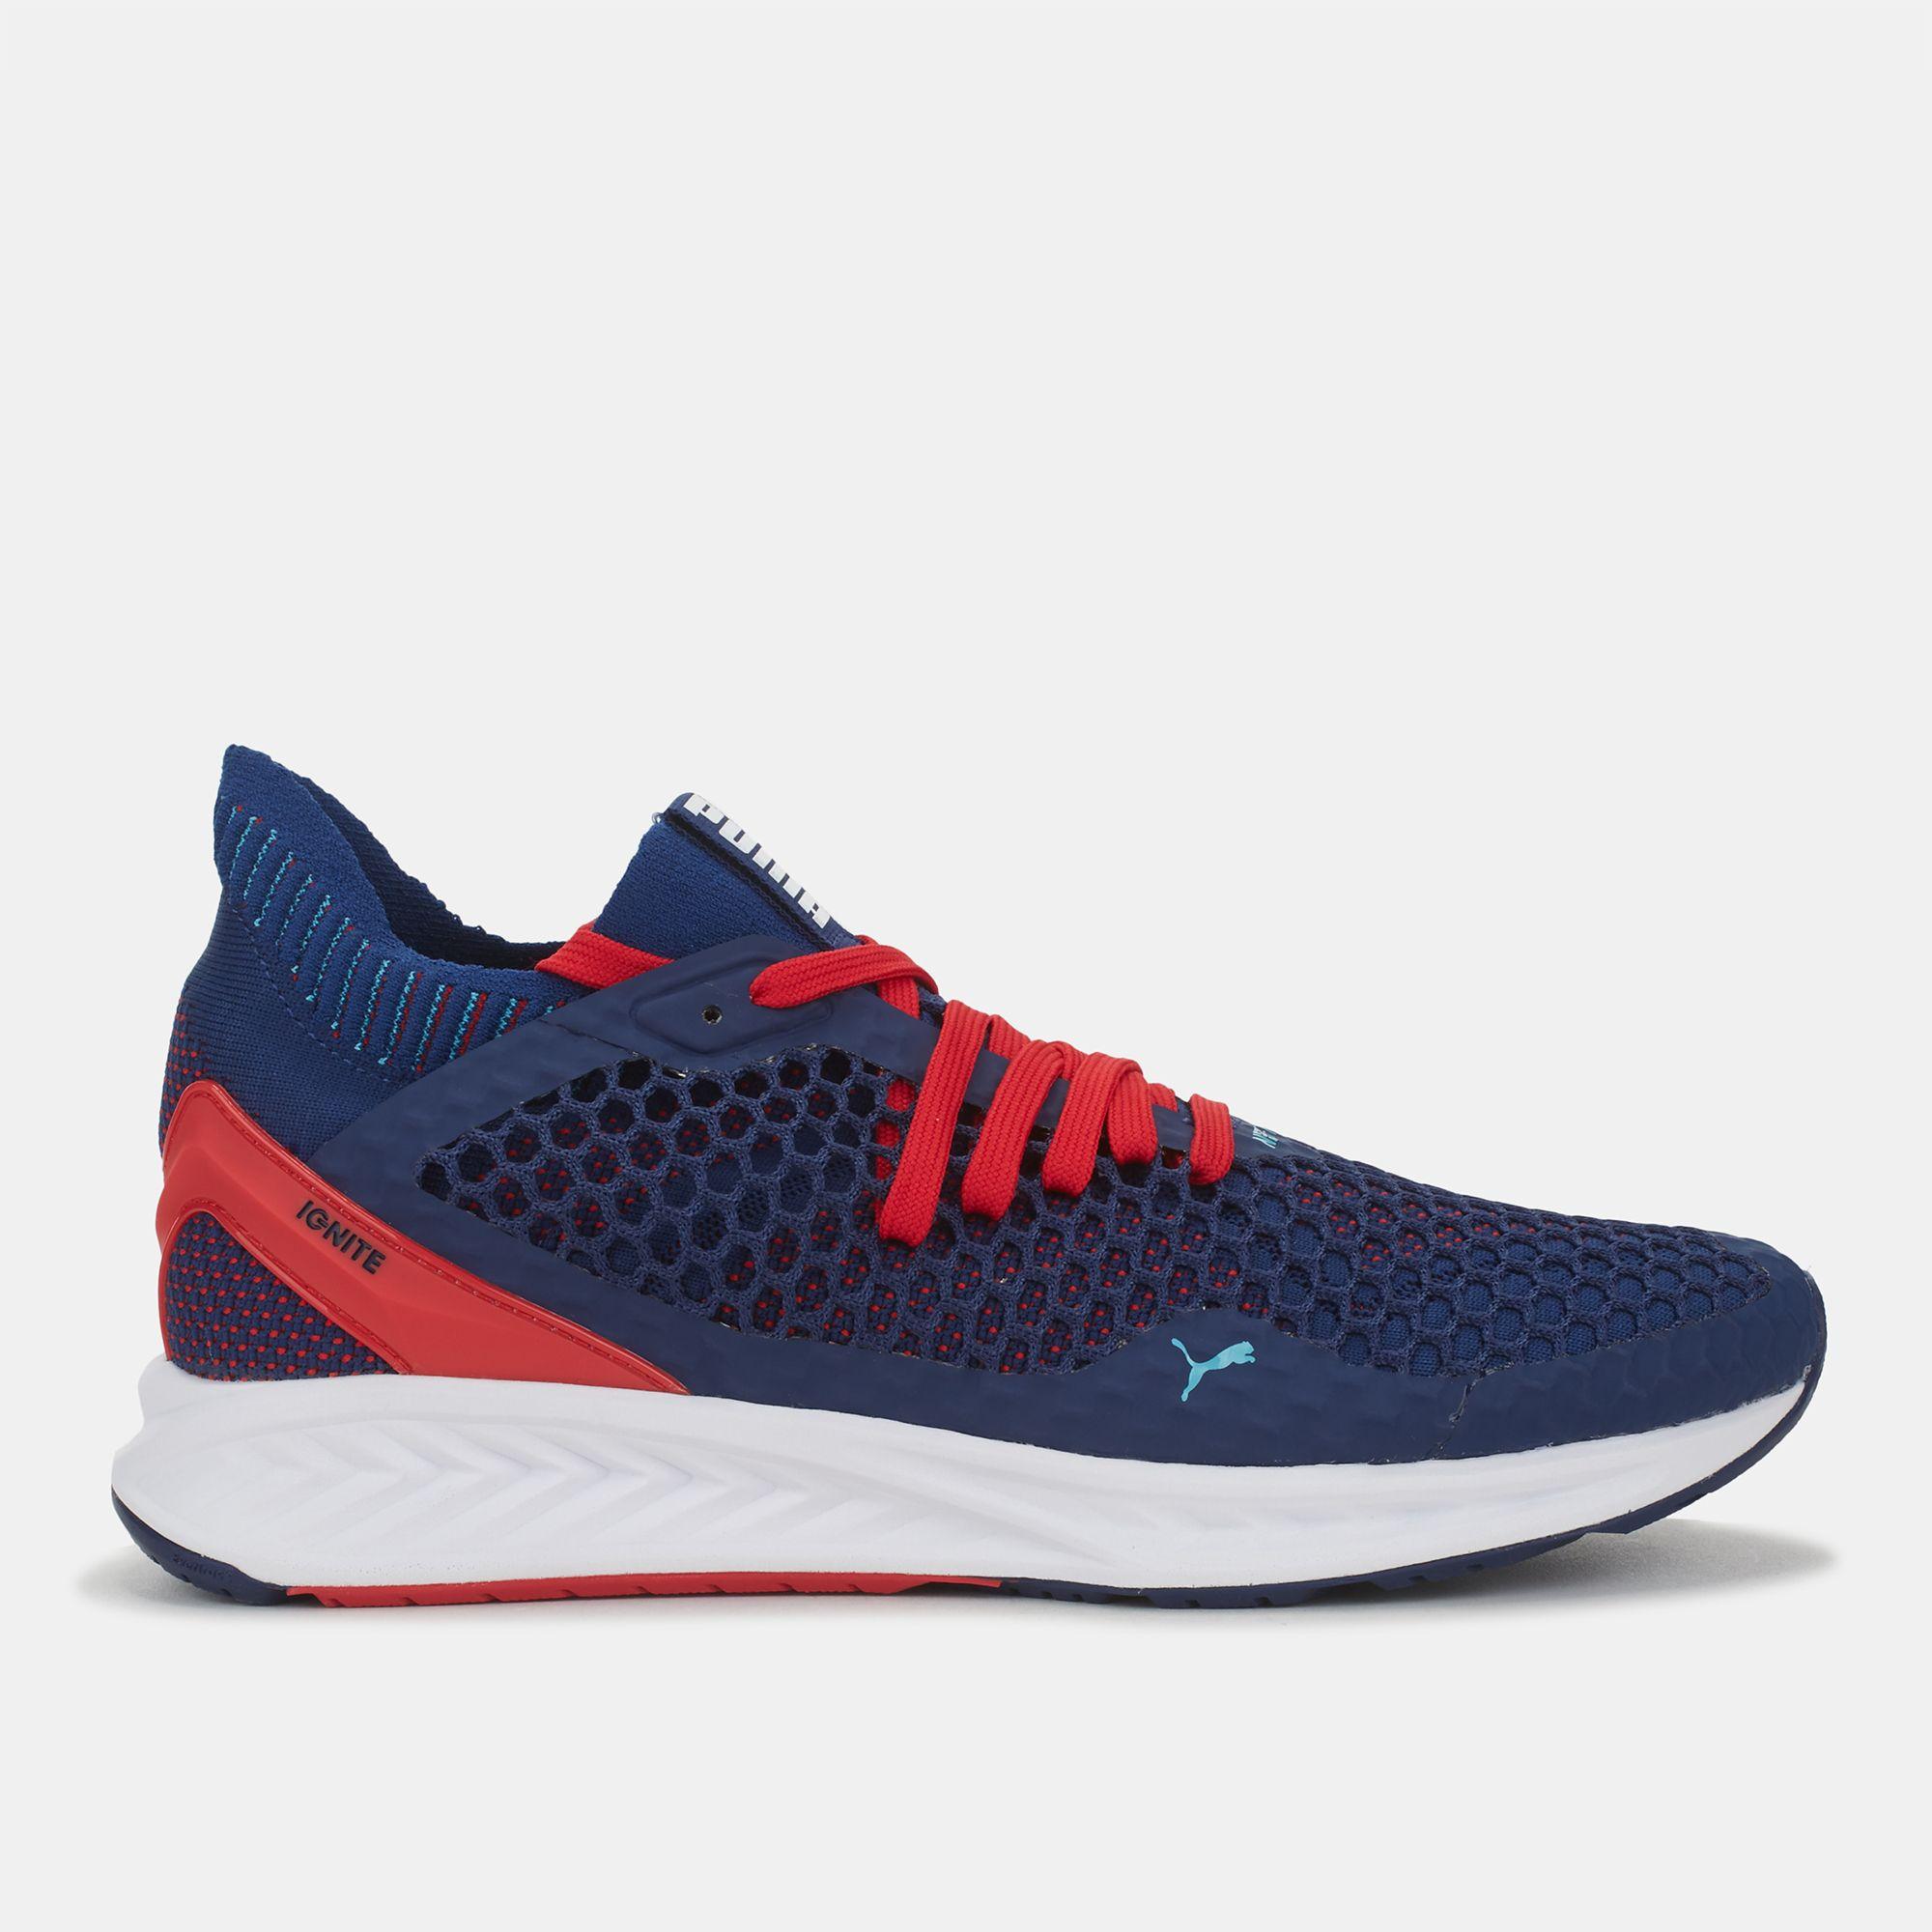 b8cf9d3b727 Shop Blue Puma Speed Ignite Netfit Running Shoe for Mens by PUMA